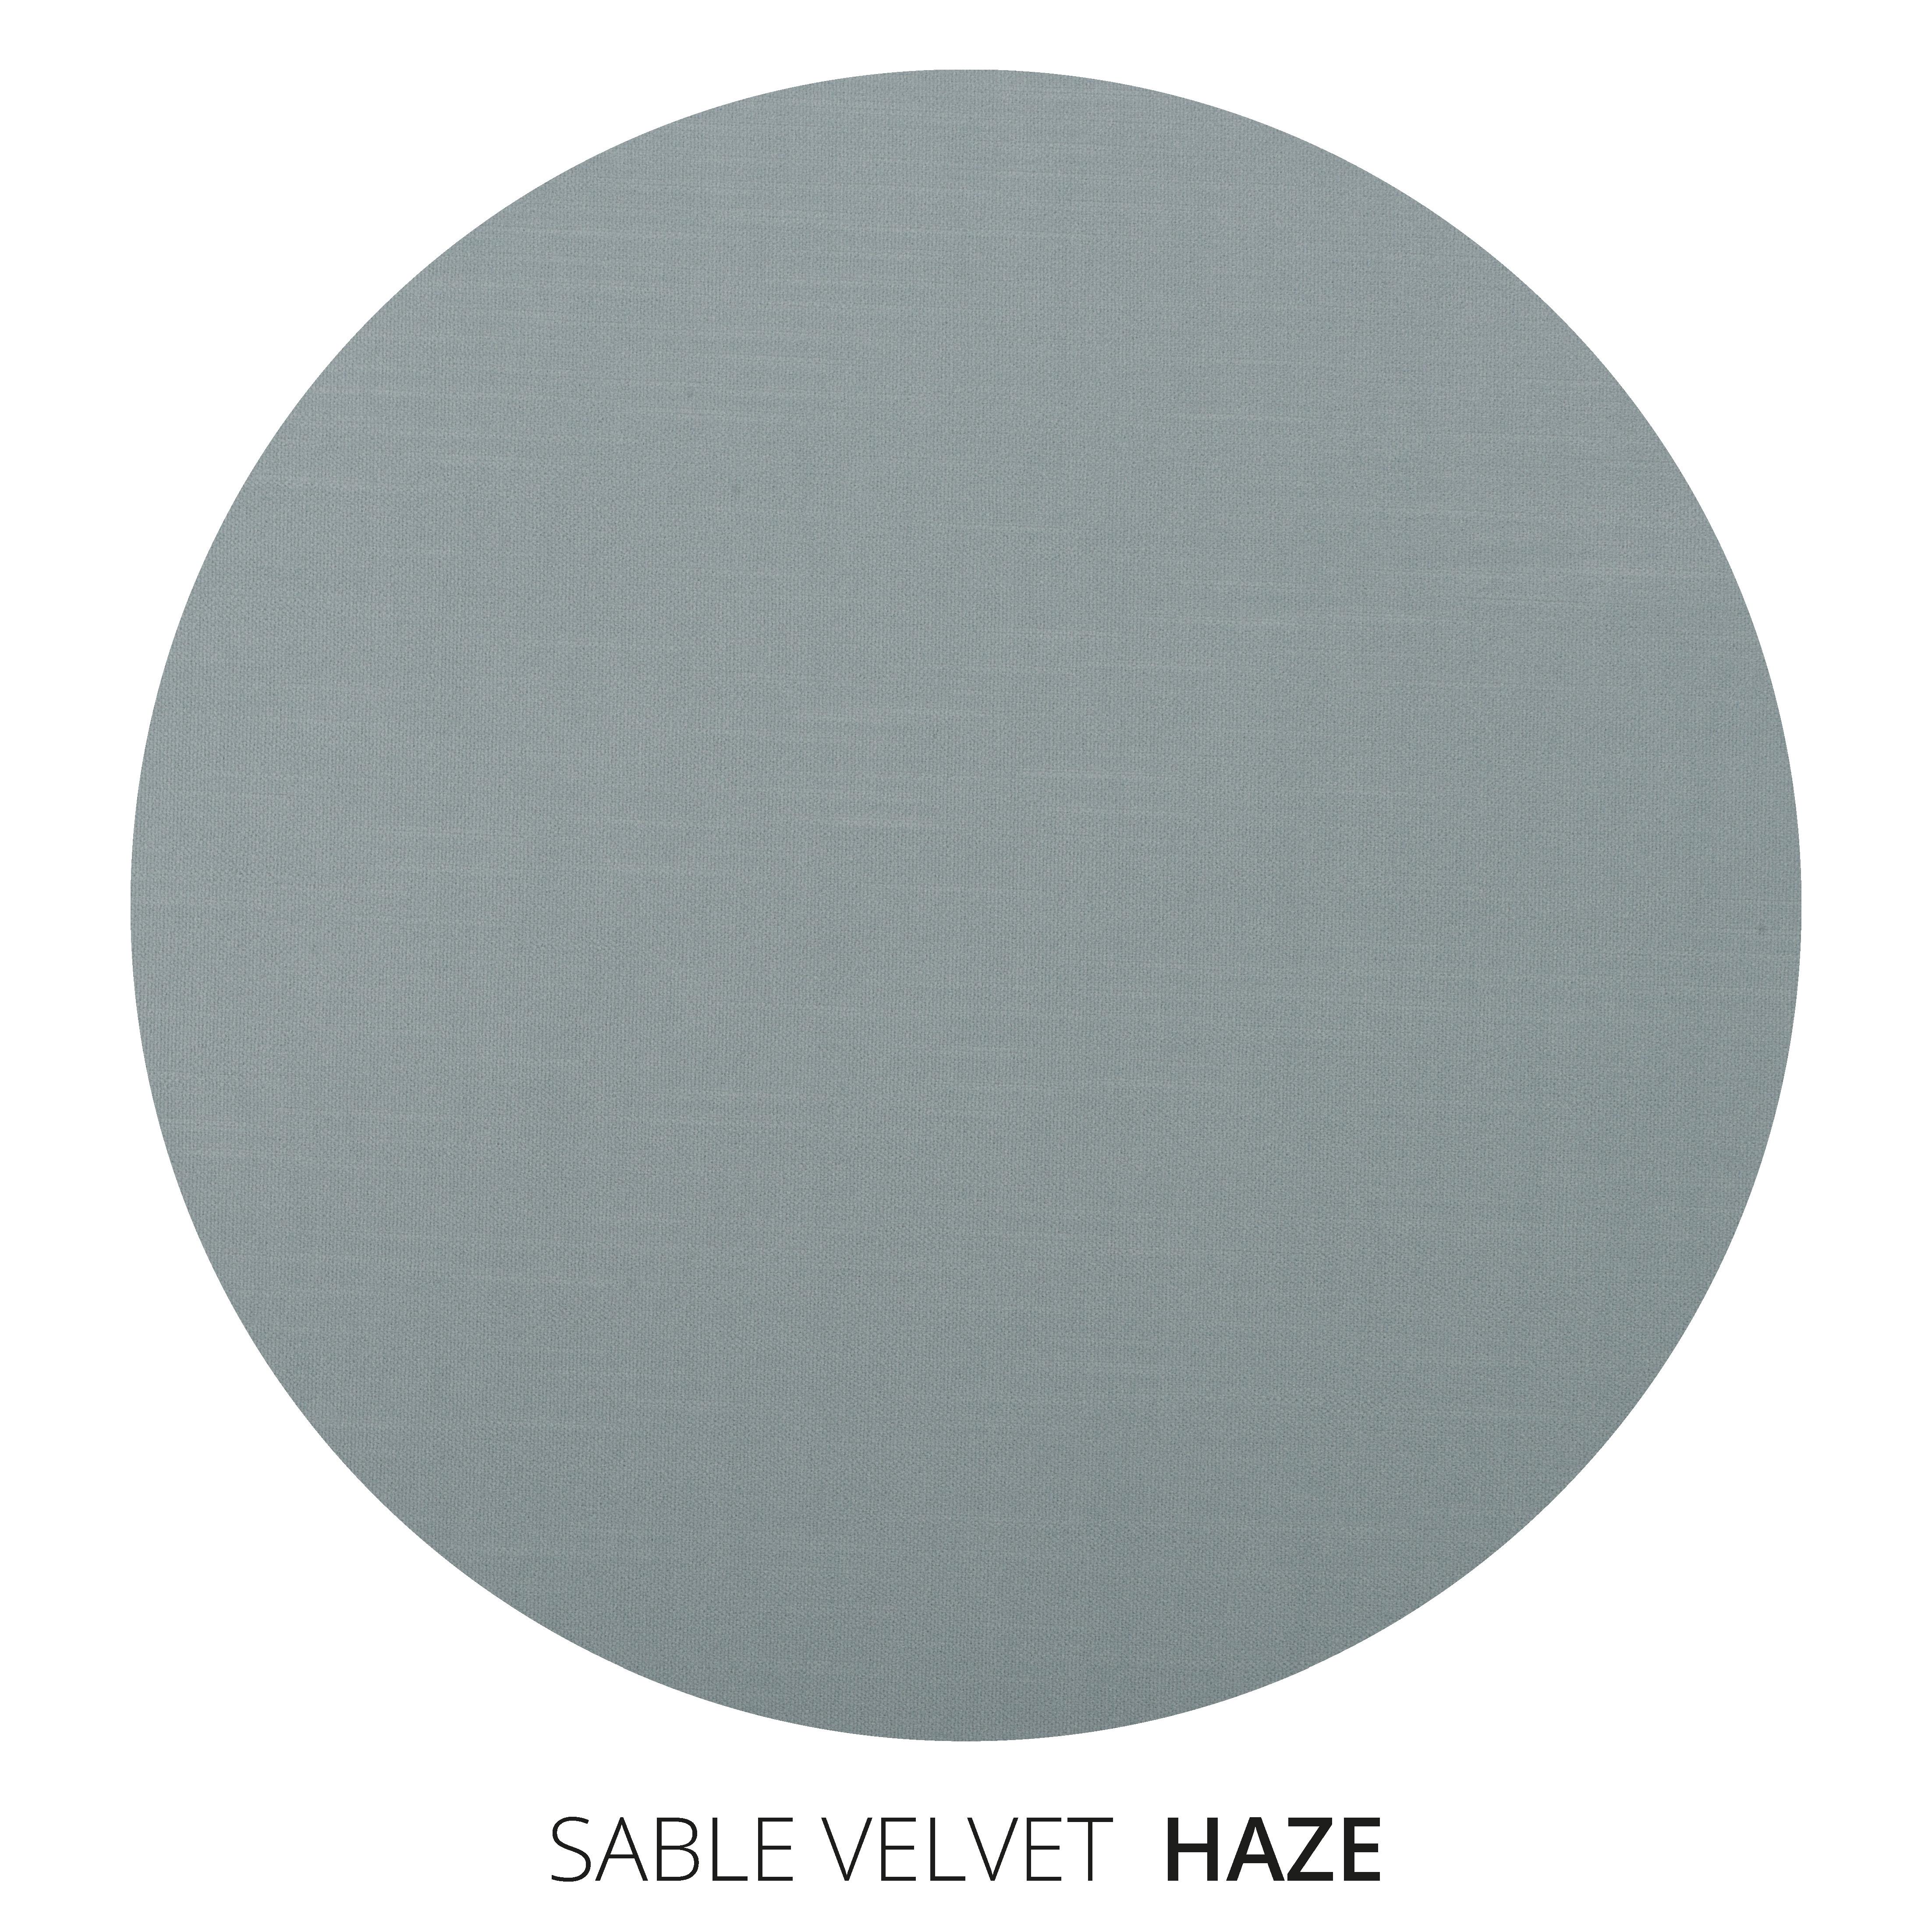 Haze Sable Velvet Swatch